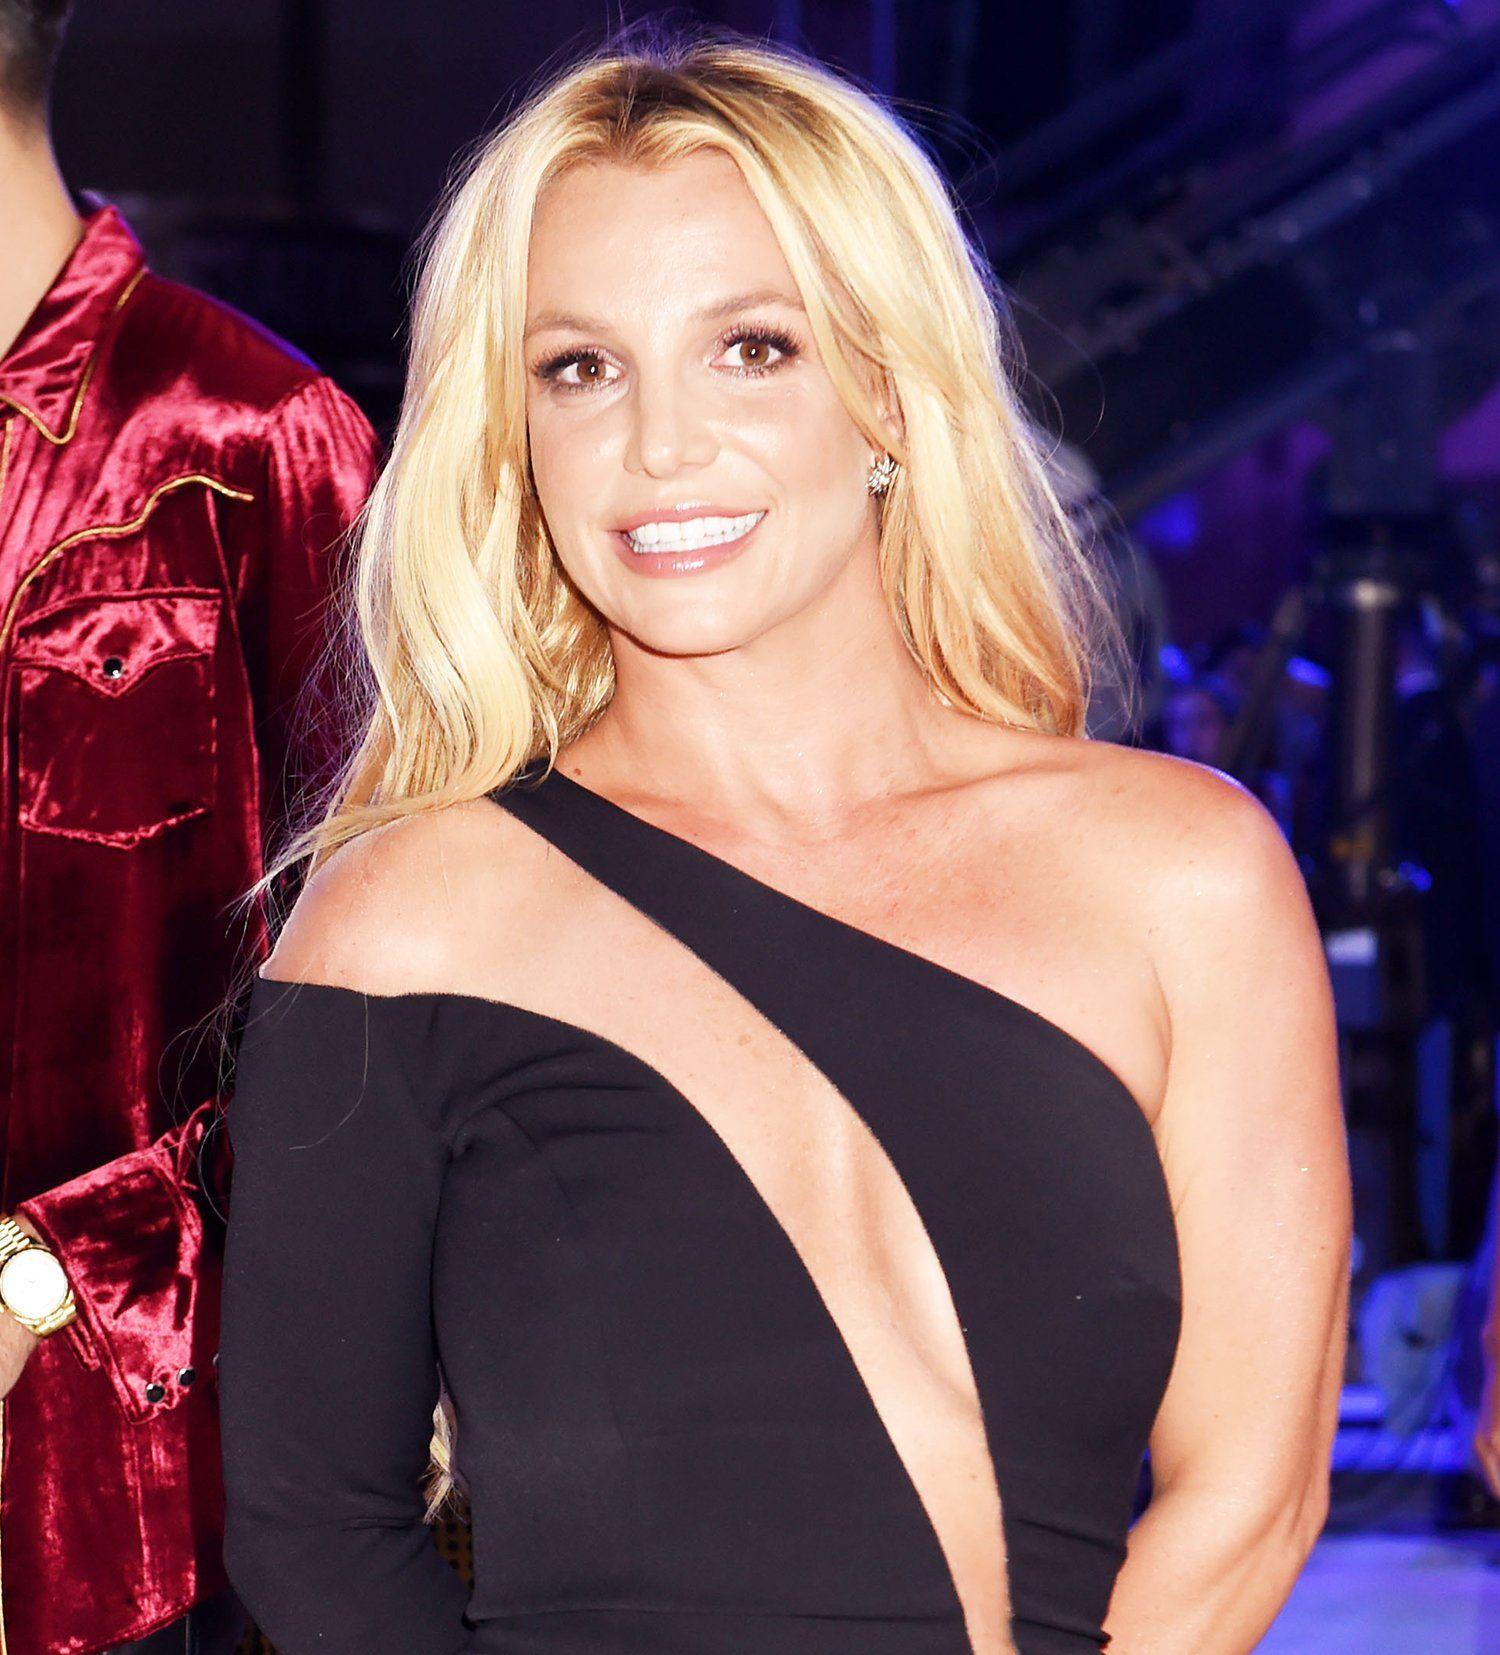 Ten years ago, Britney Spears shaved her head - Metro US